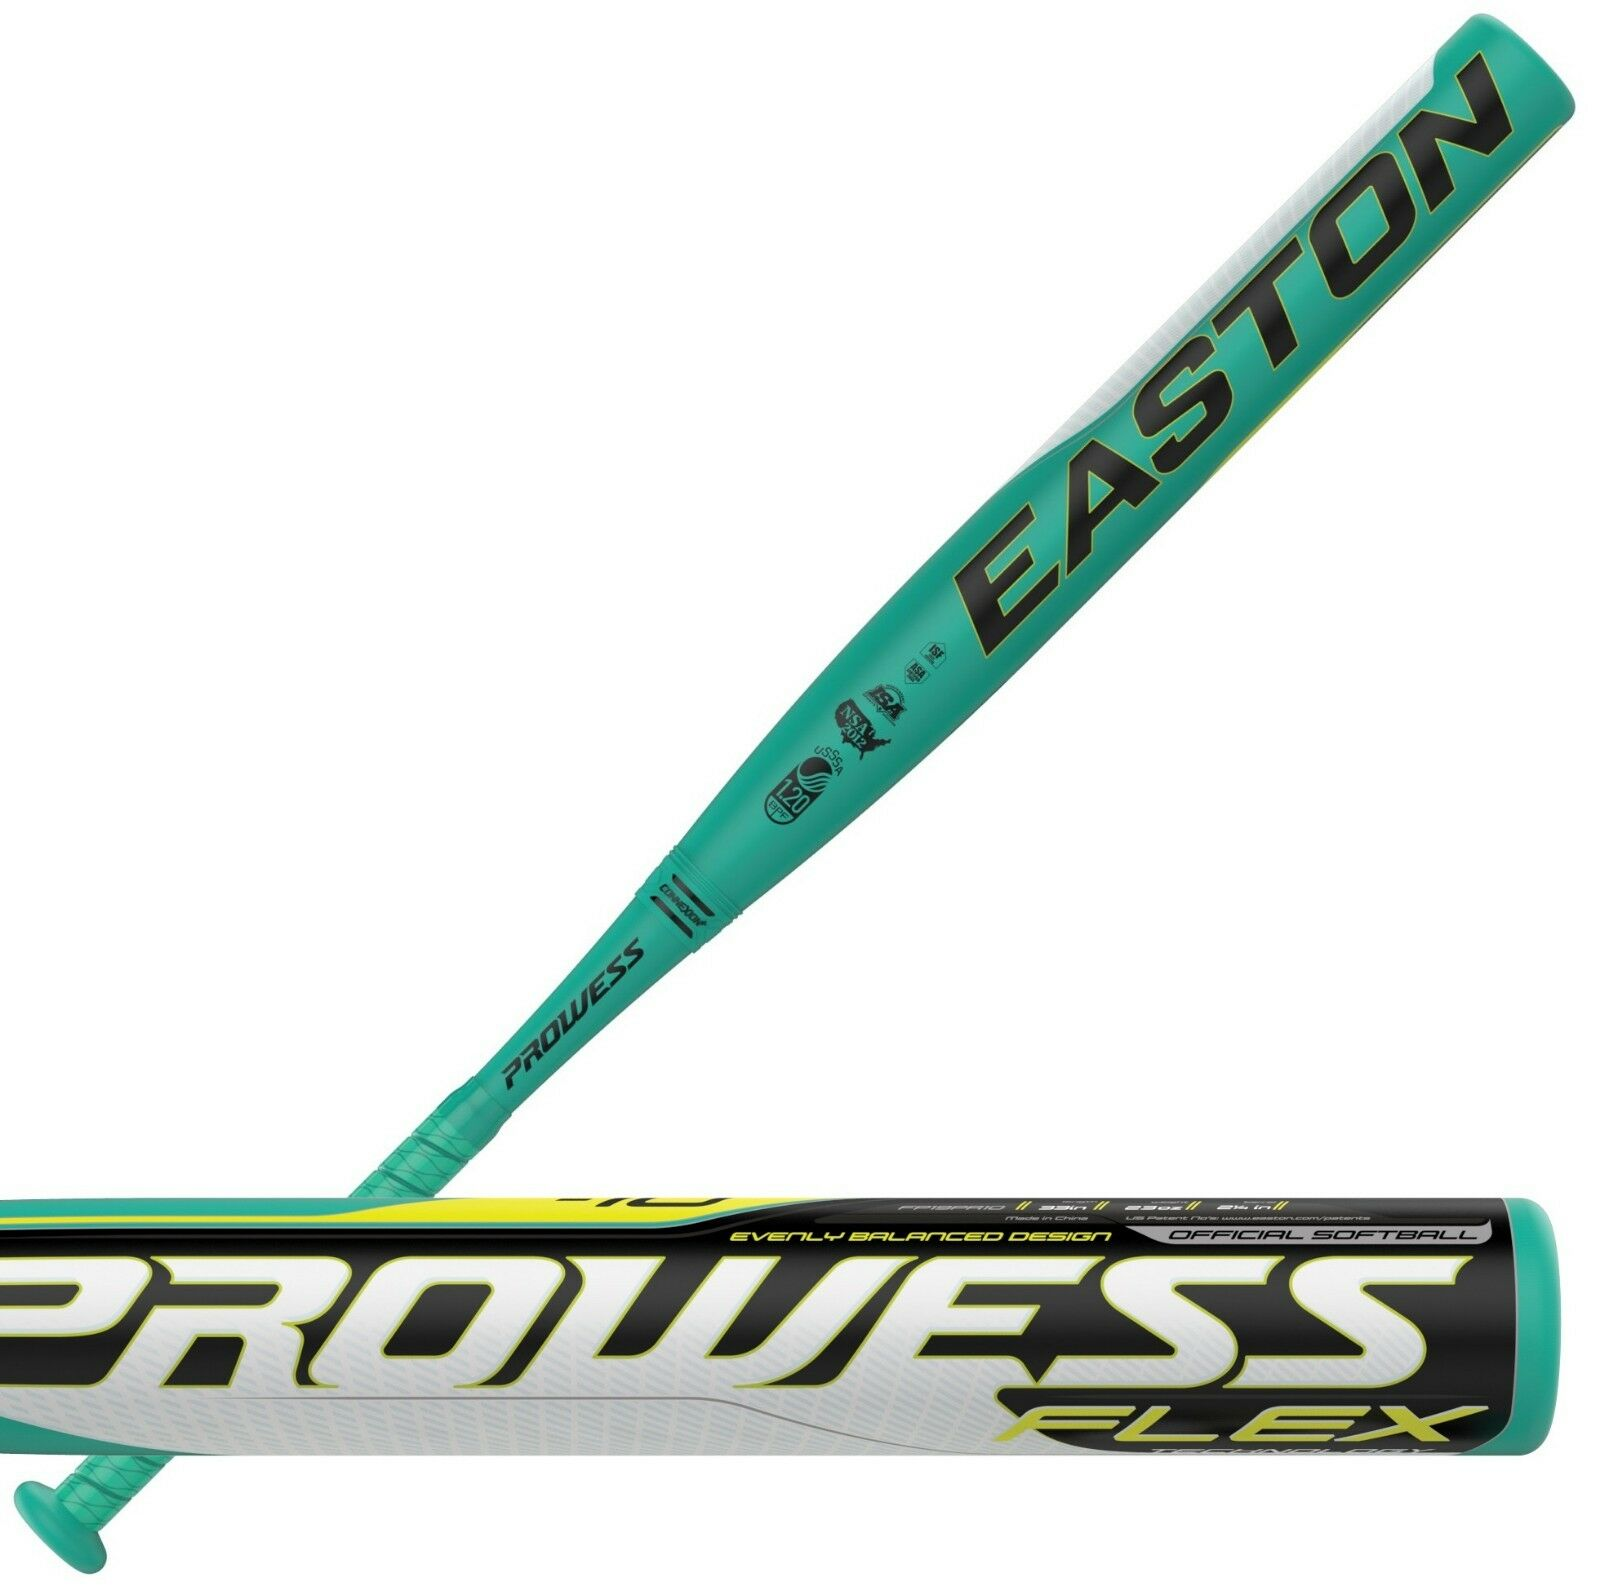 2019 Easton Prowess -10 34  24 oz. Women's Fastpitch Softball Bat FP19PR10